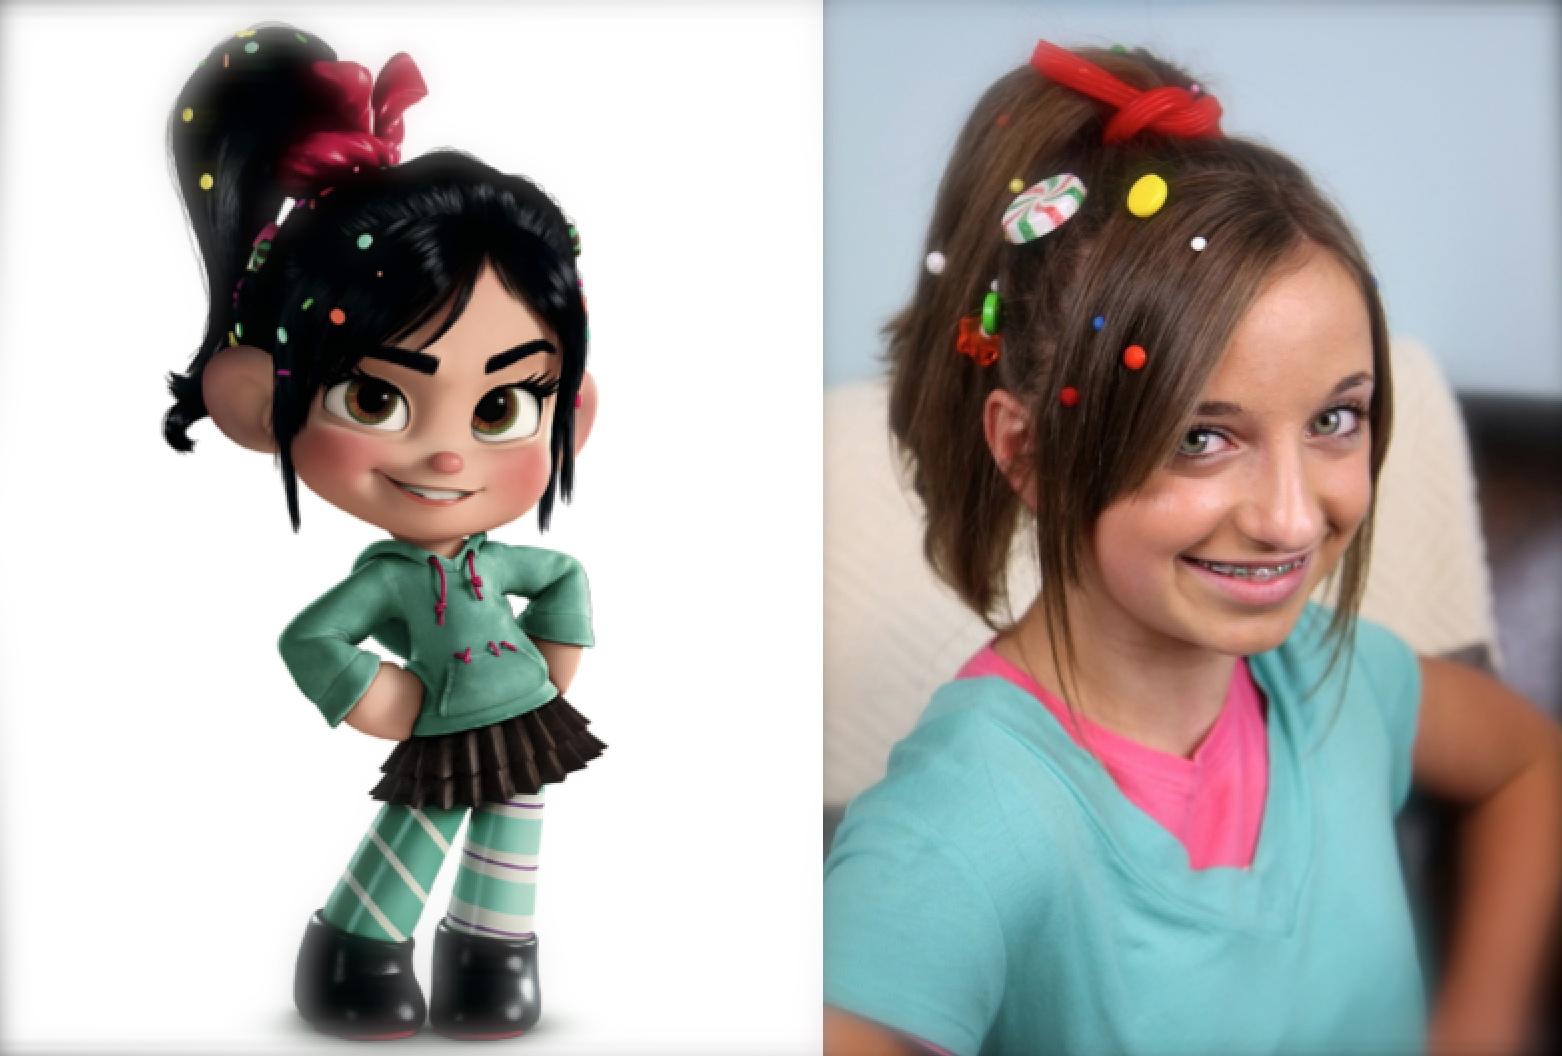 Astonishing Hairstyles 8 Year Old Girls Short Hairstyles For Black Women Fulllsitofus